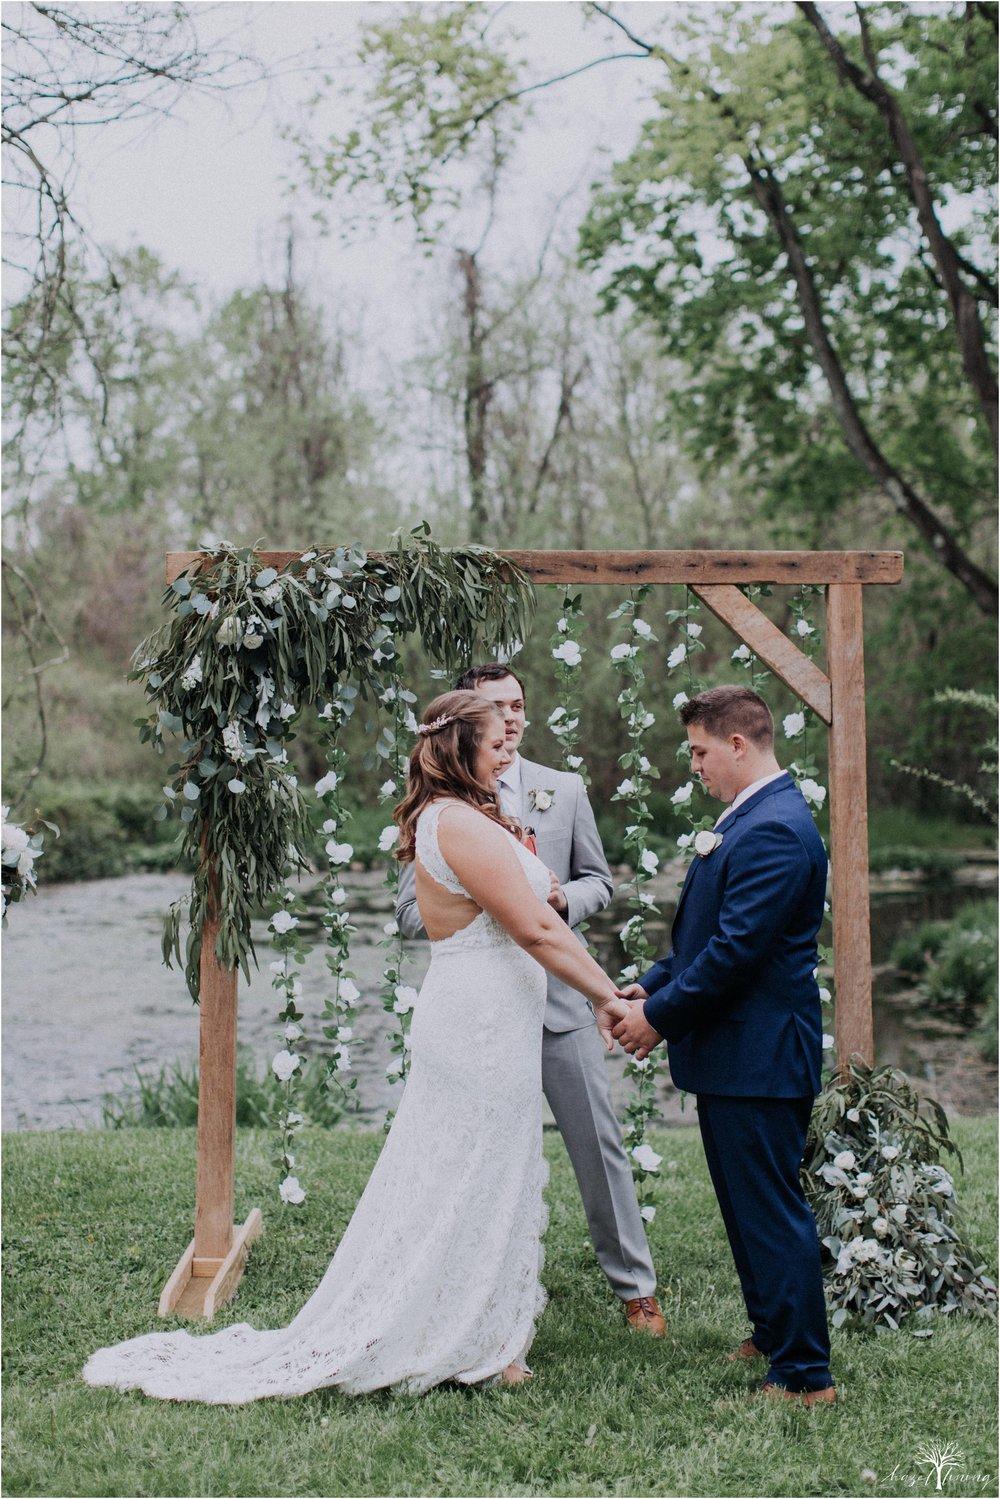 hazel-lining-travel-wedding-elopement-photography-abby-skyler-hunt-the-willis-house-york-pennsylvania-outdoor-estate-wedding_0082.jpg